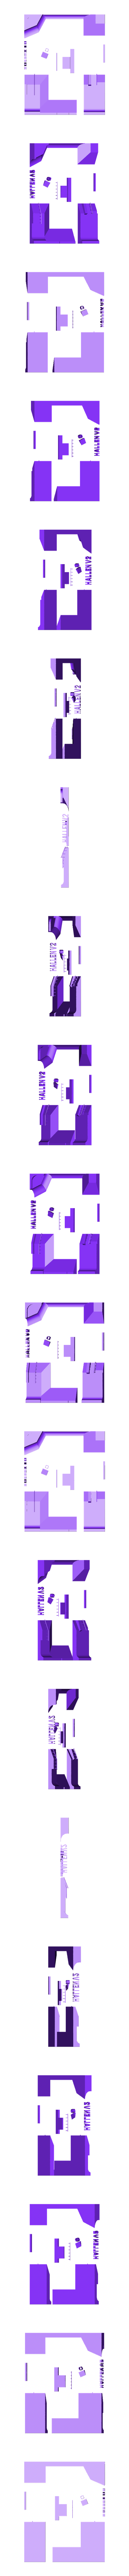 Vejgaard Skatehal (FINAL VERSION).stl Télécharger fichier STL gratuit Hallen v2 • Objet pour impression 3D, mathiassag